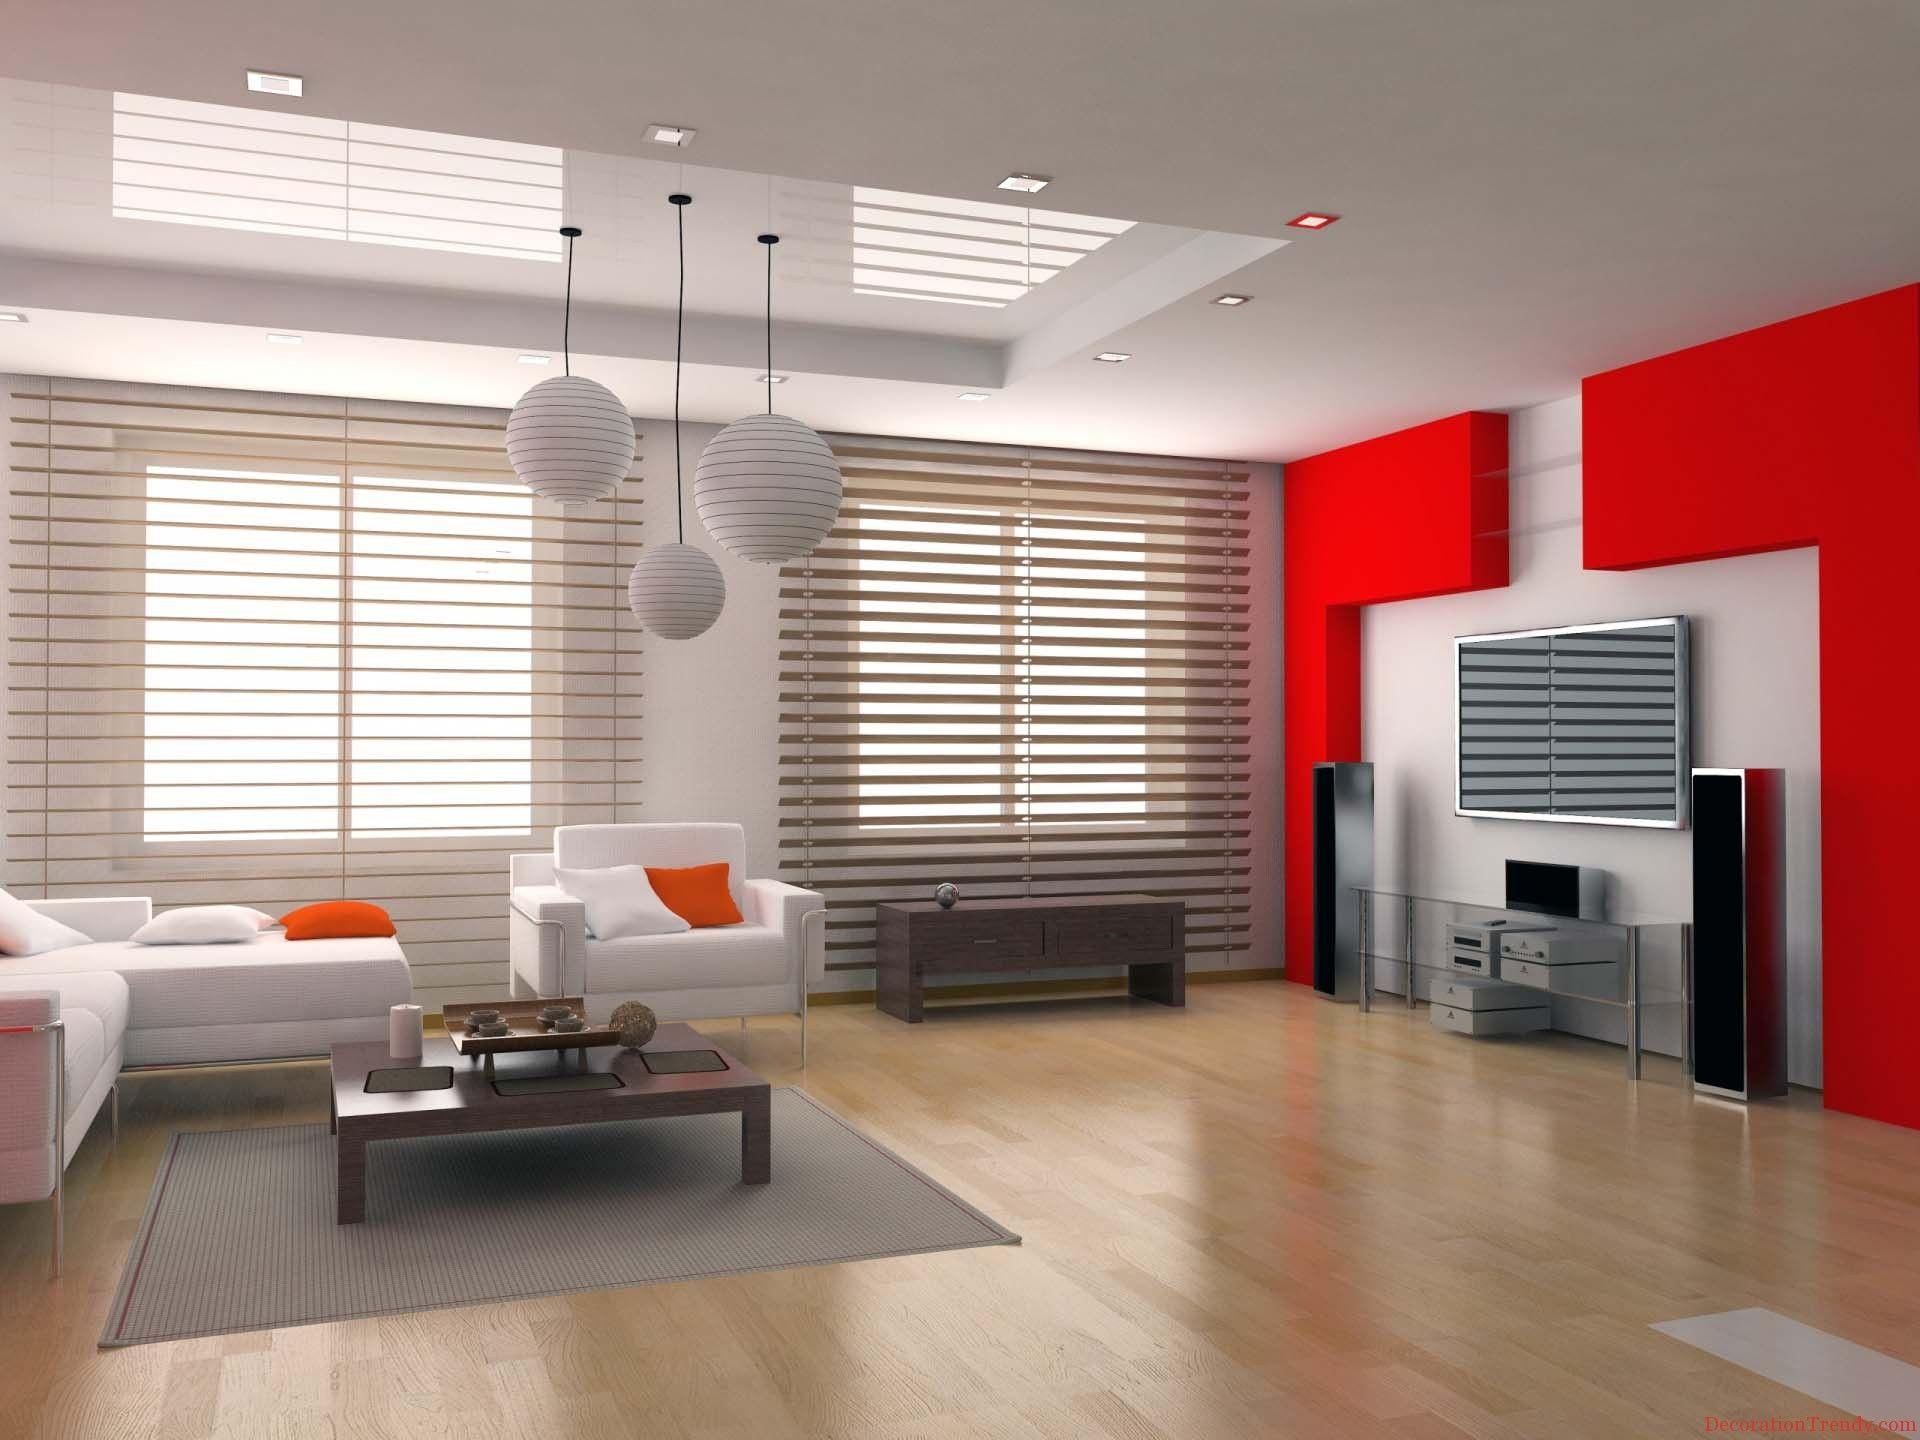 2014-zebra-curtain-models-design-decoration-idea-window-11.jpg (1920 ...